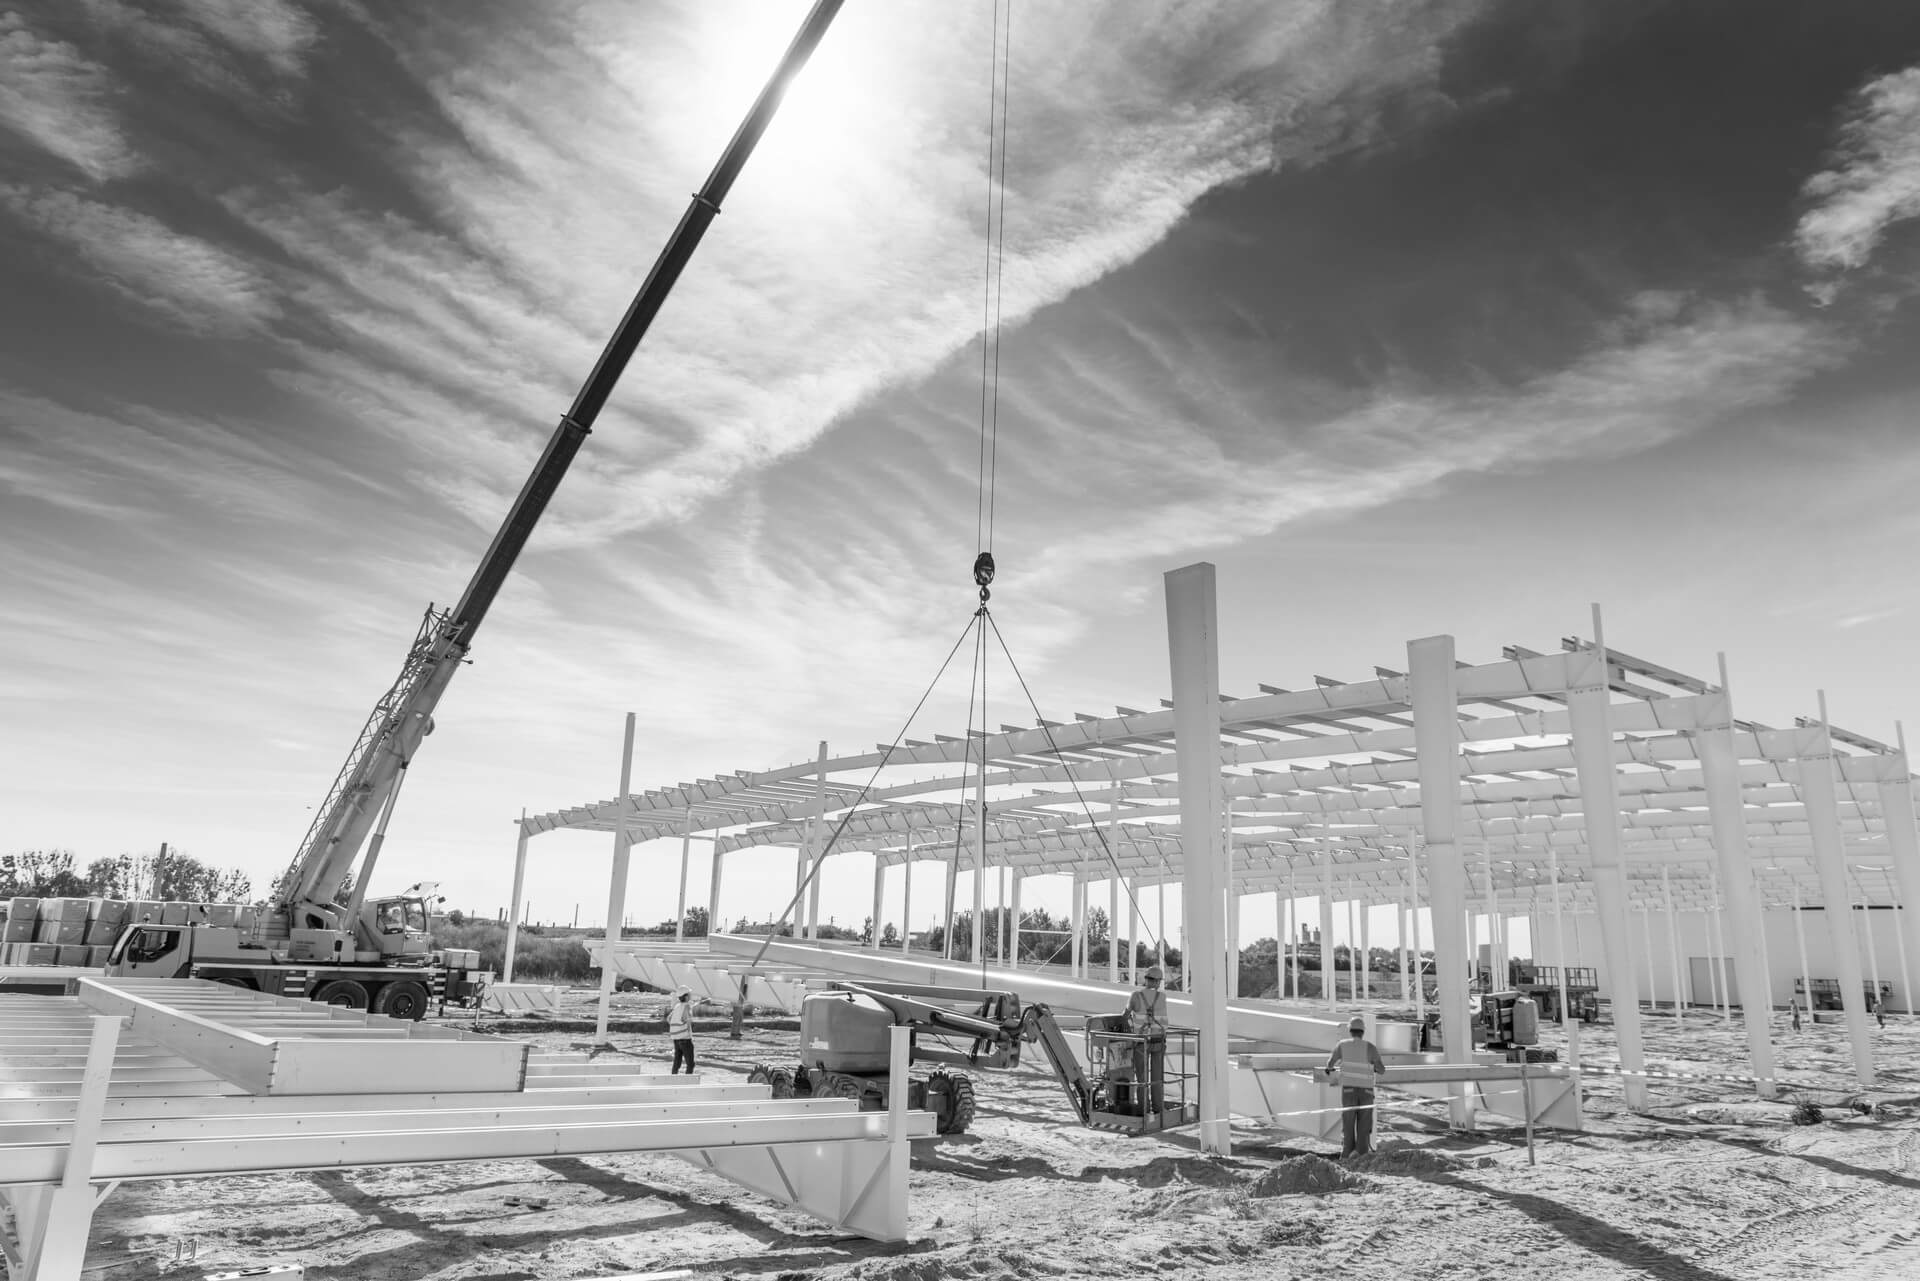 stavebna-spolocnost-tbau-hruba-stavba-stavebne-prace-stavebne-prace